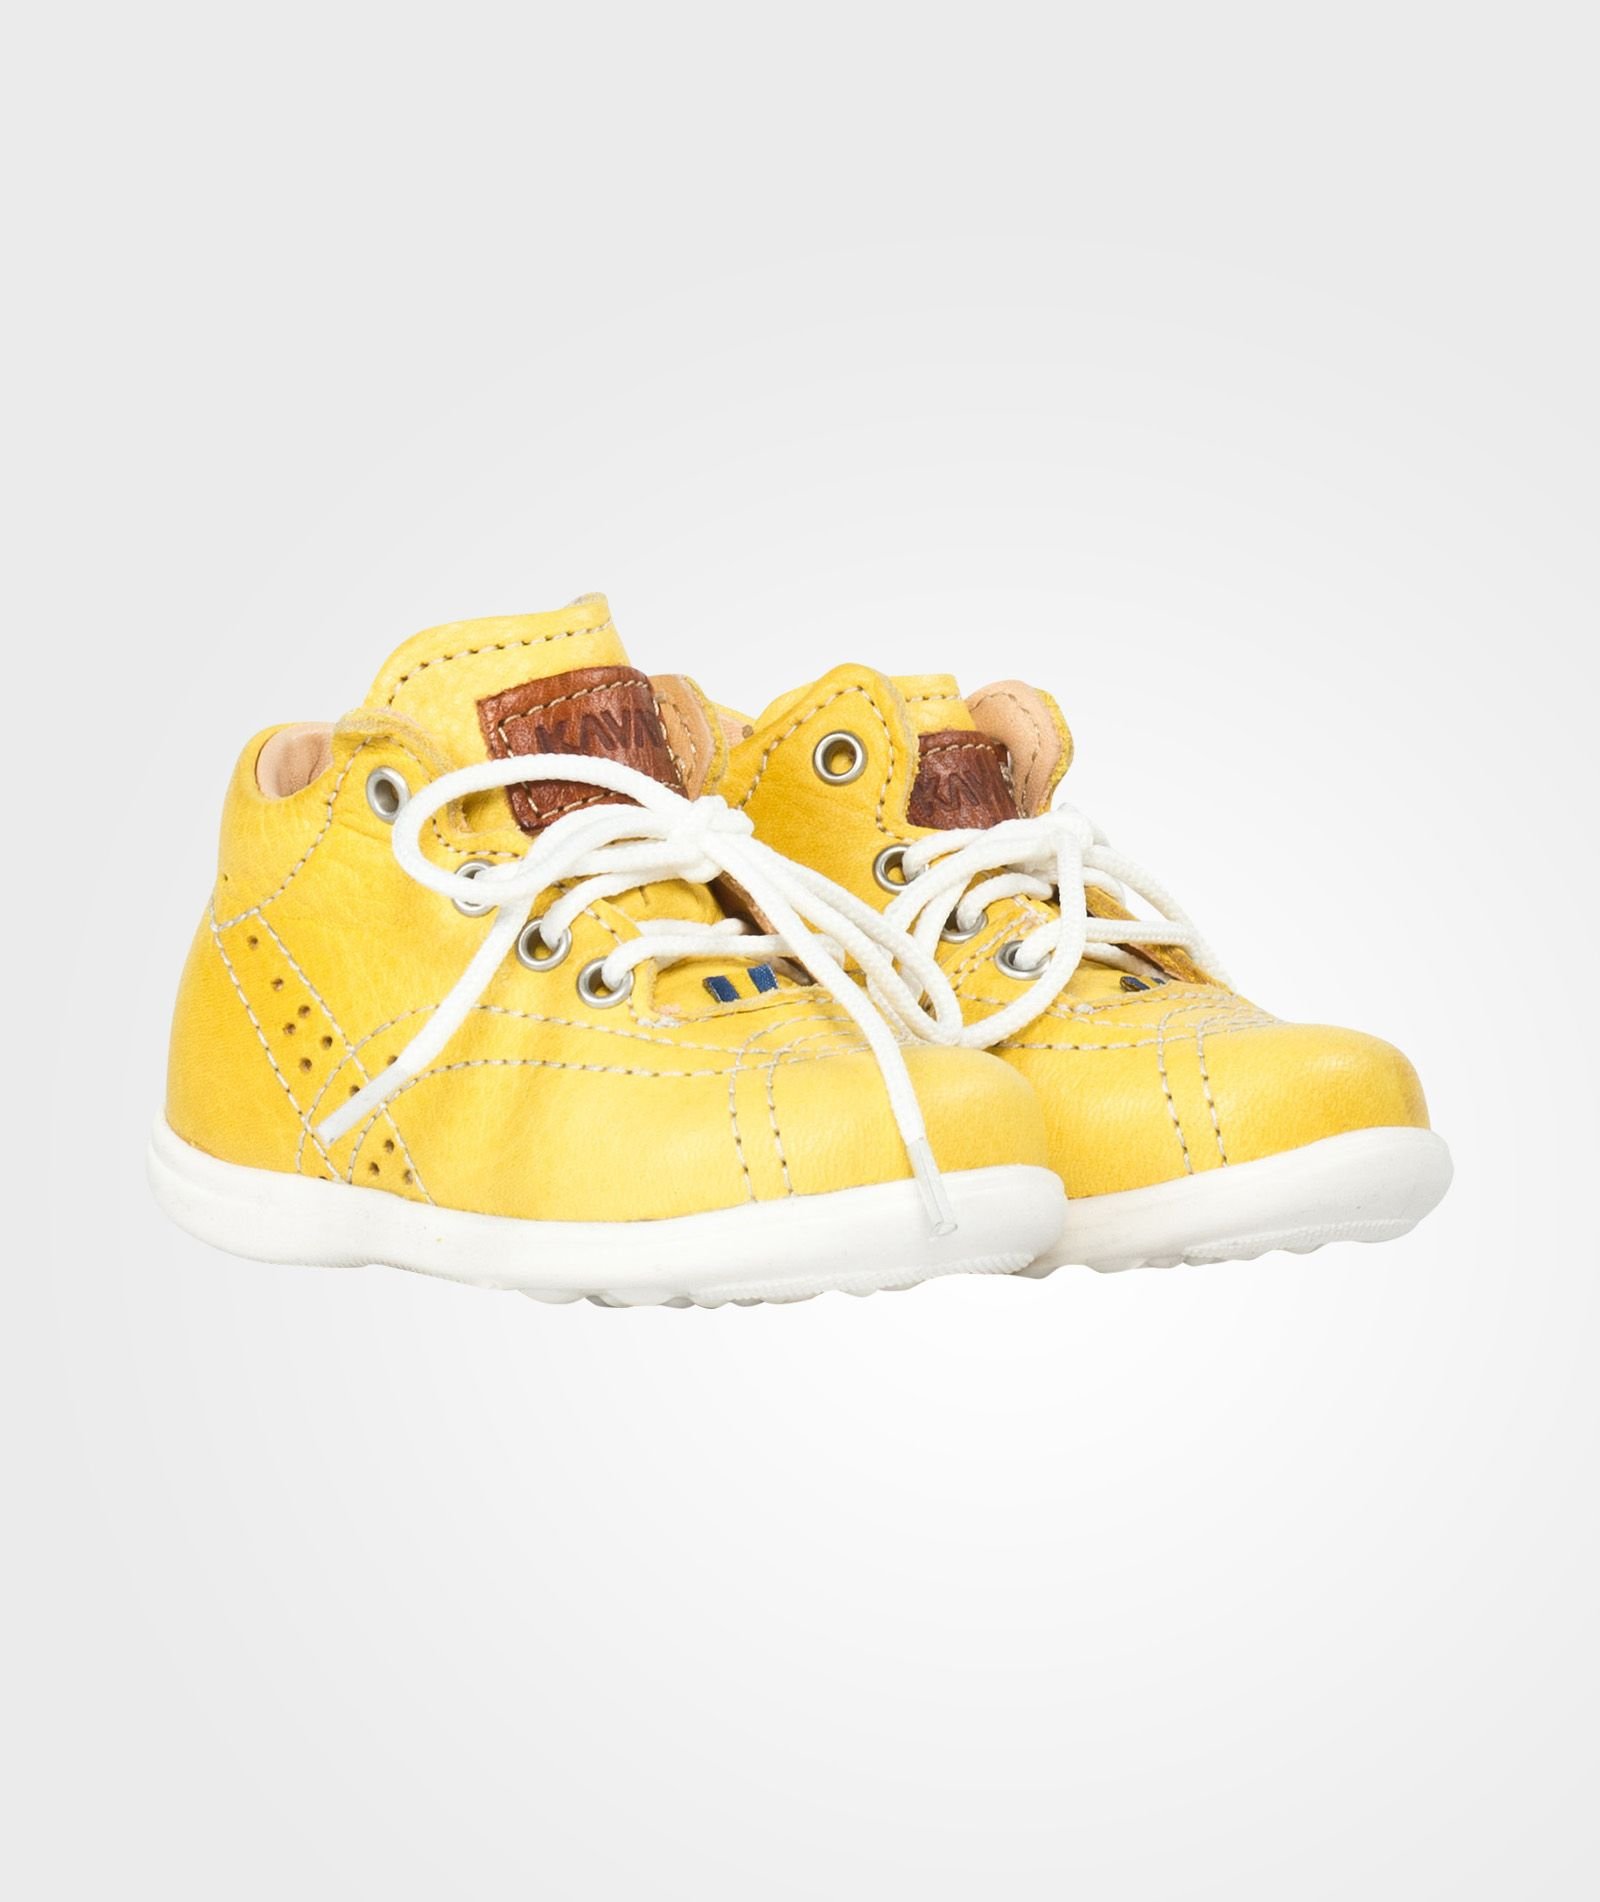 KavatEDSBRO - Baby shoes - yellow Hbj166